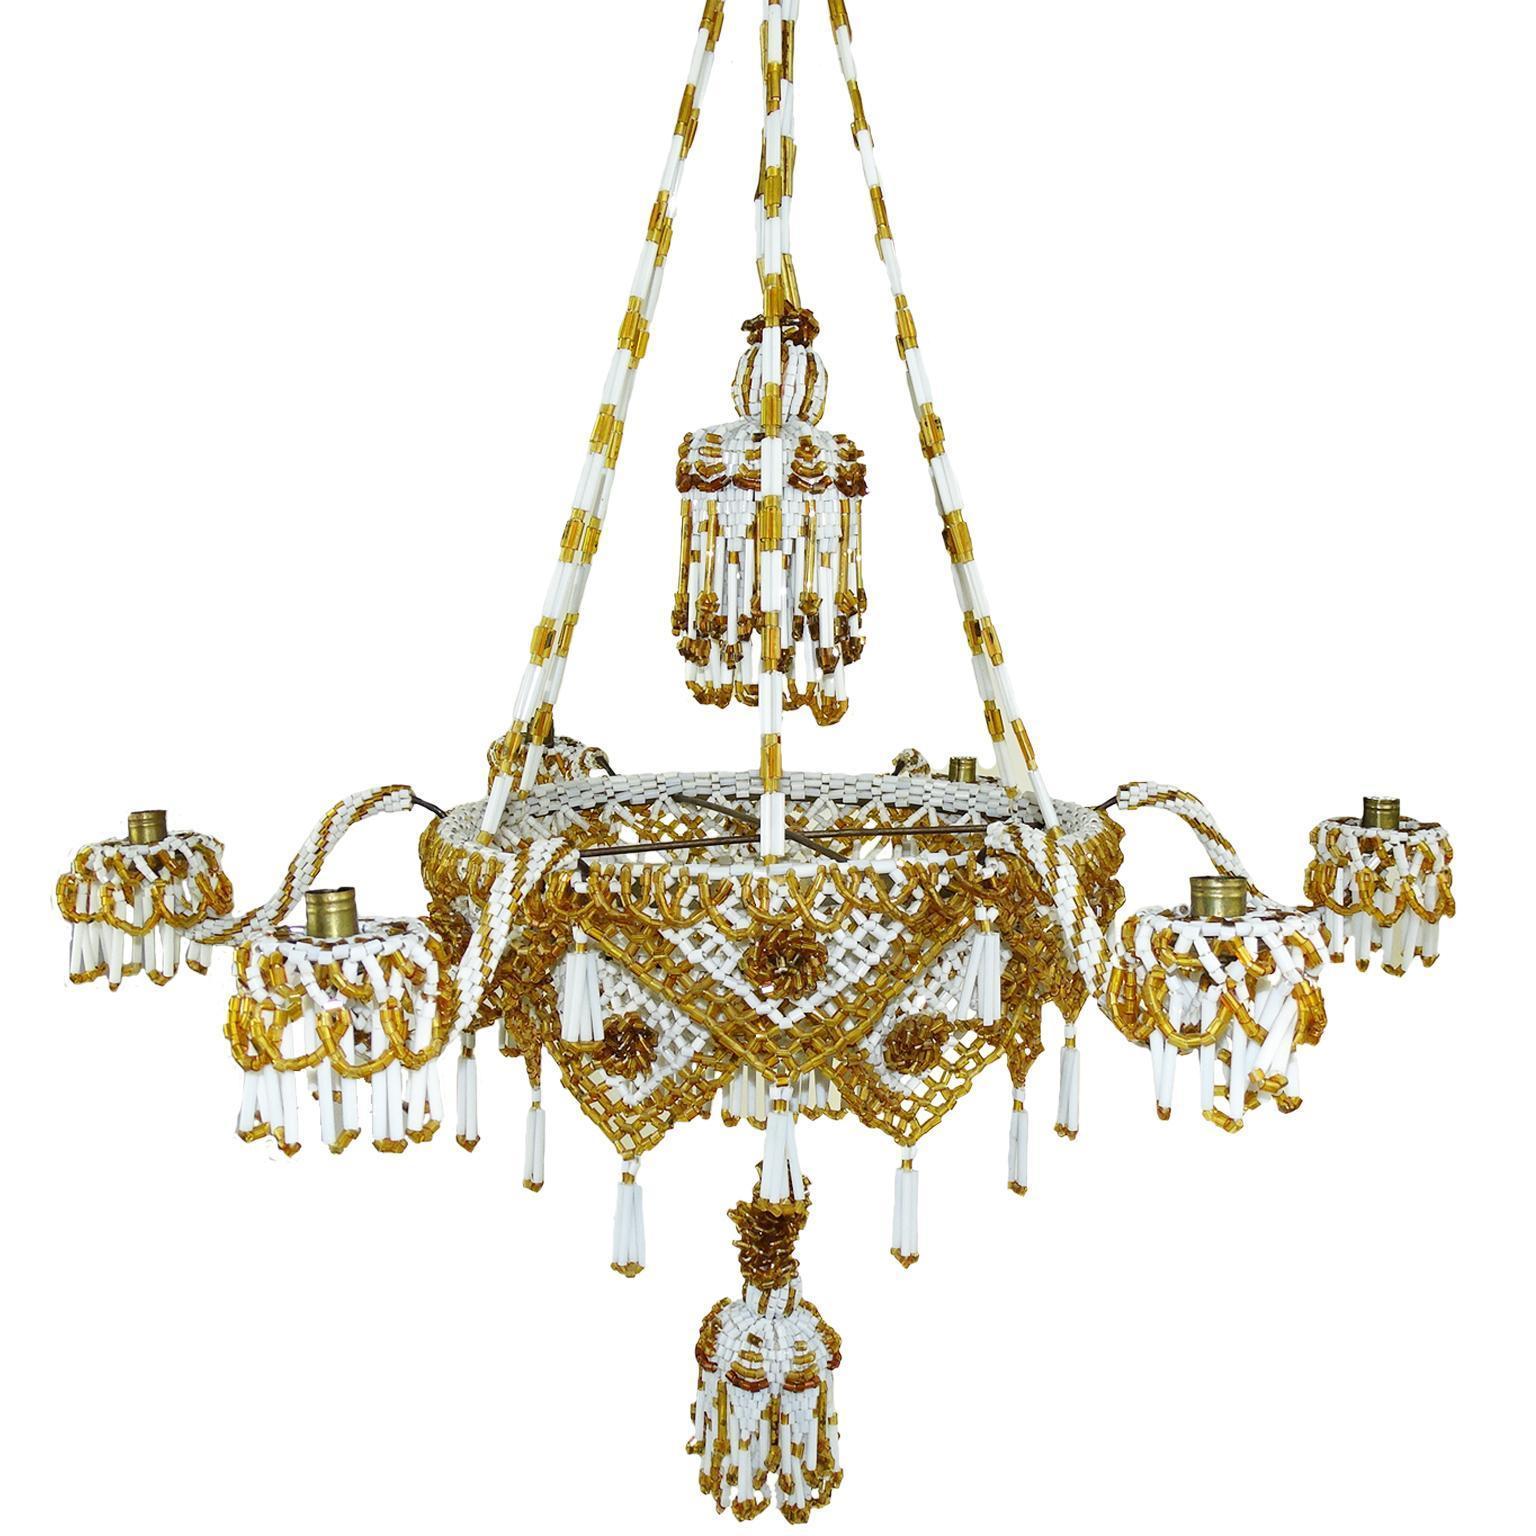 1880 German Candle Luster Erzgebirge Beads Glass Lamp Chandelier